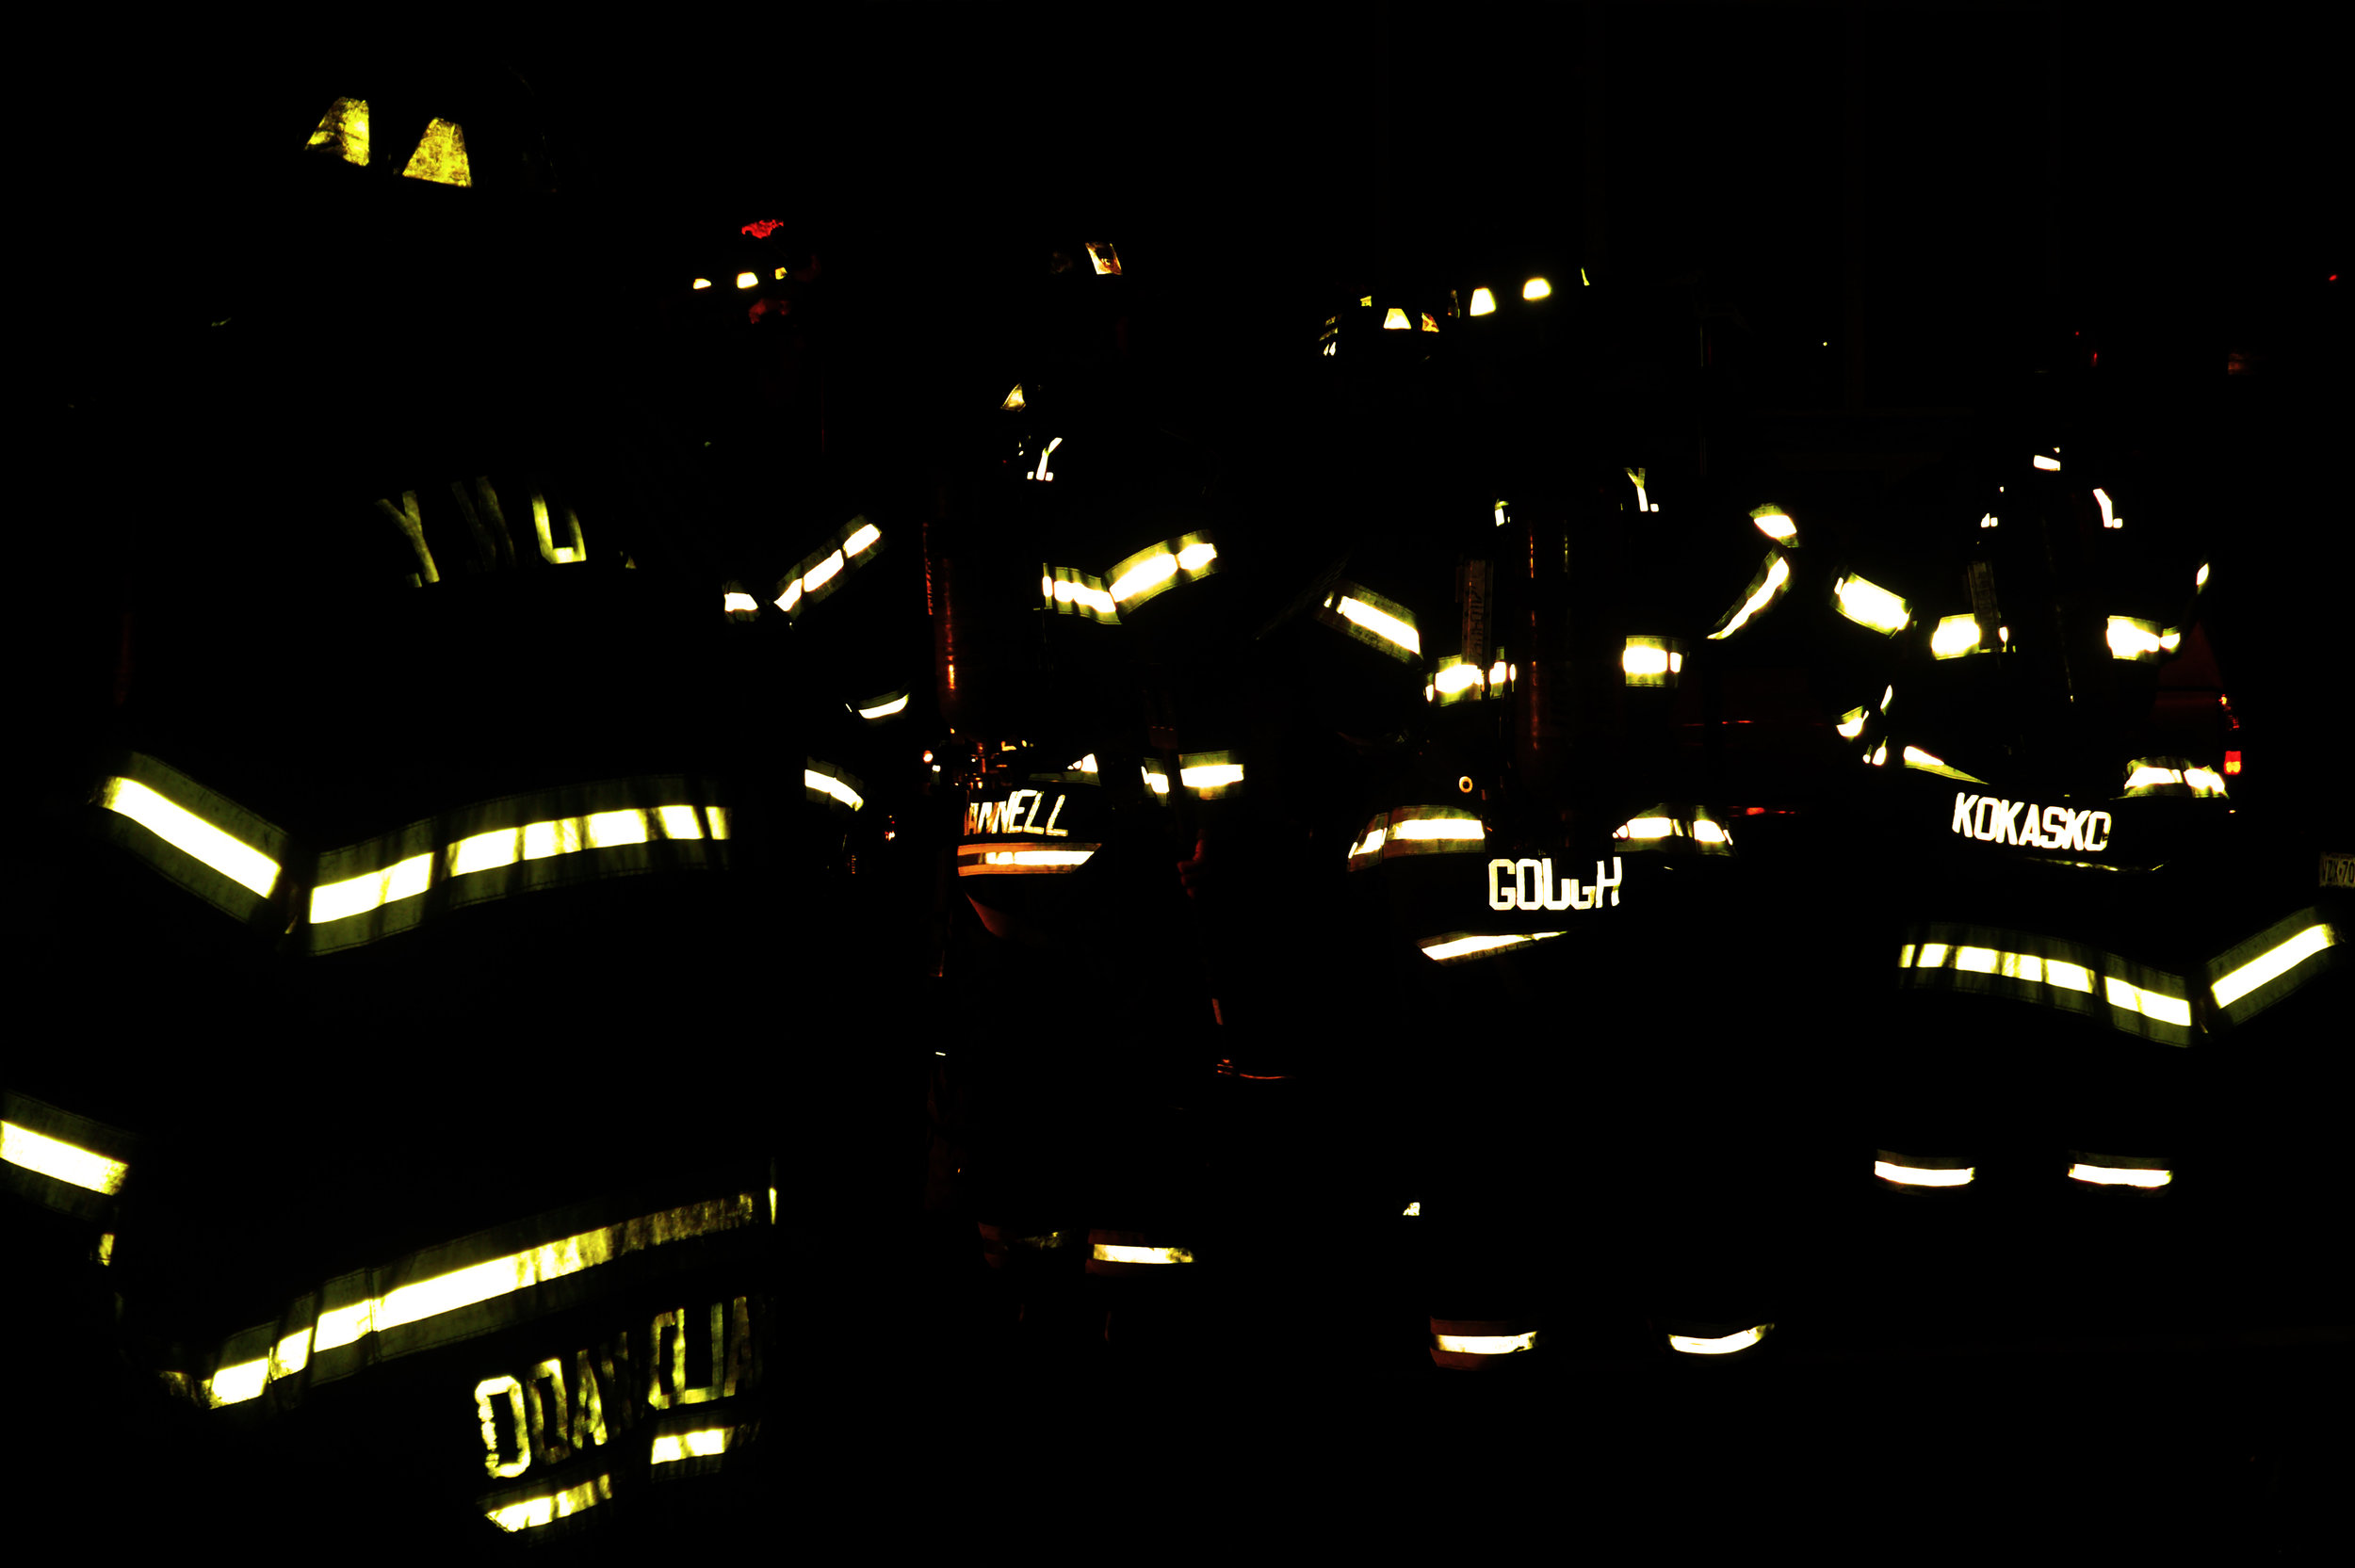 'Glow 5' 2009 © Andrea Blanch